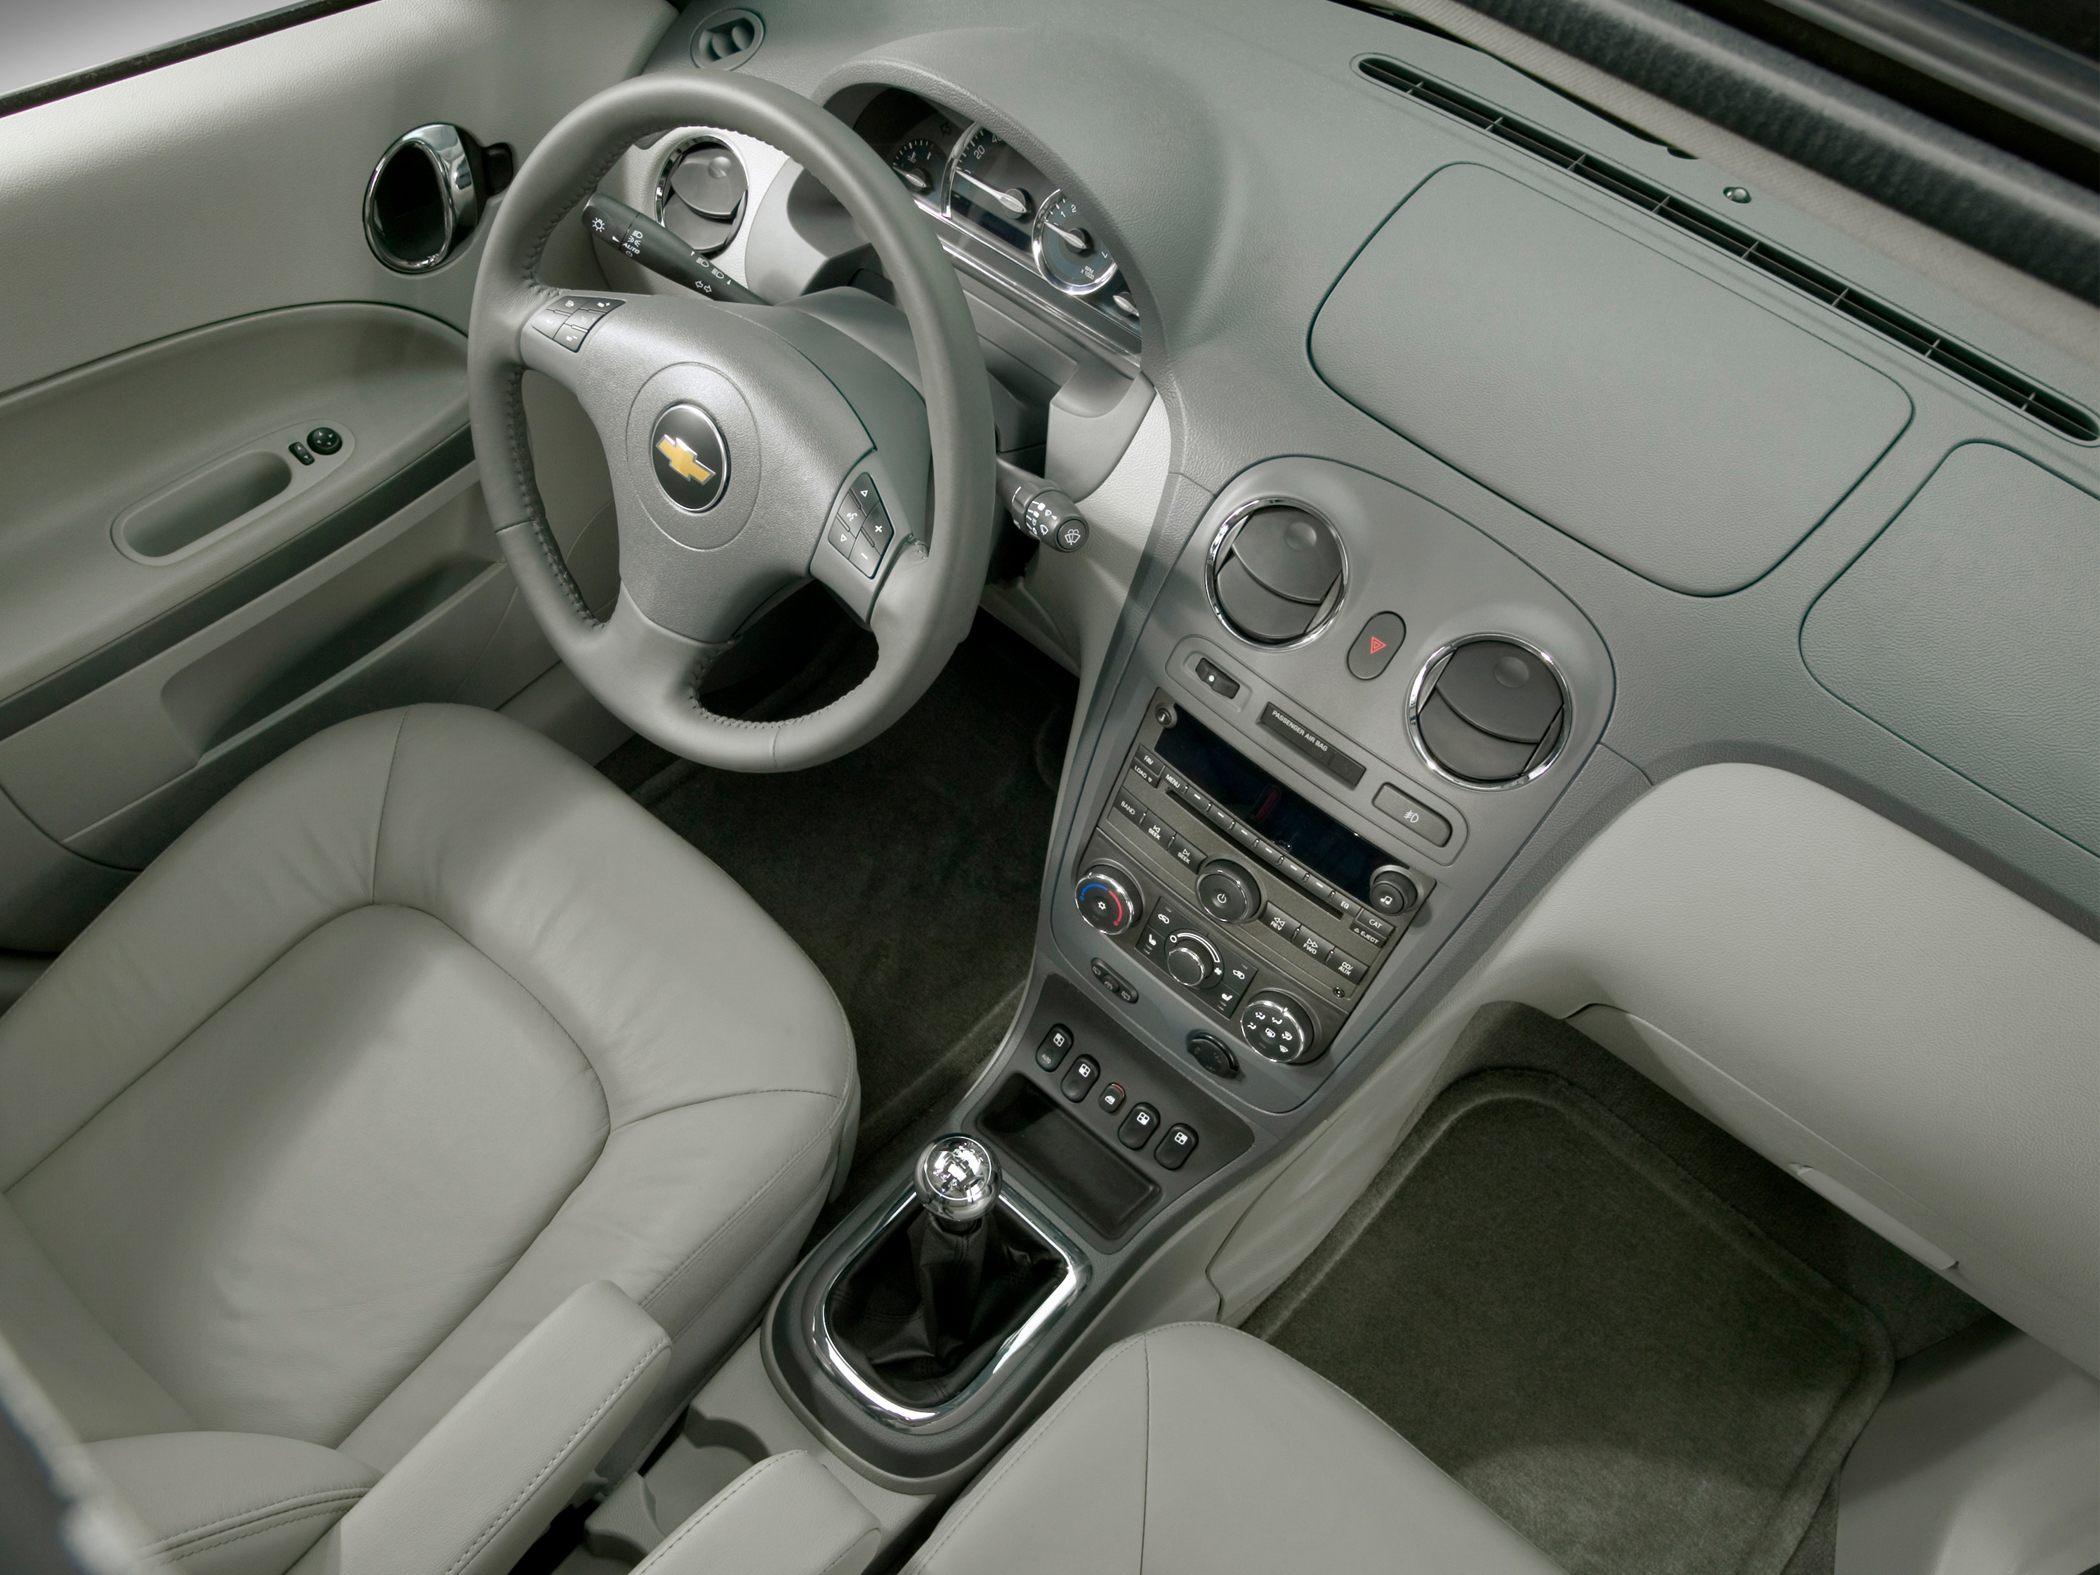 CHEVROLET HHR interior